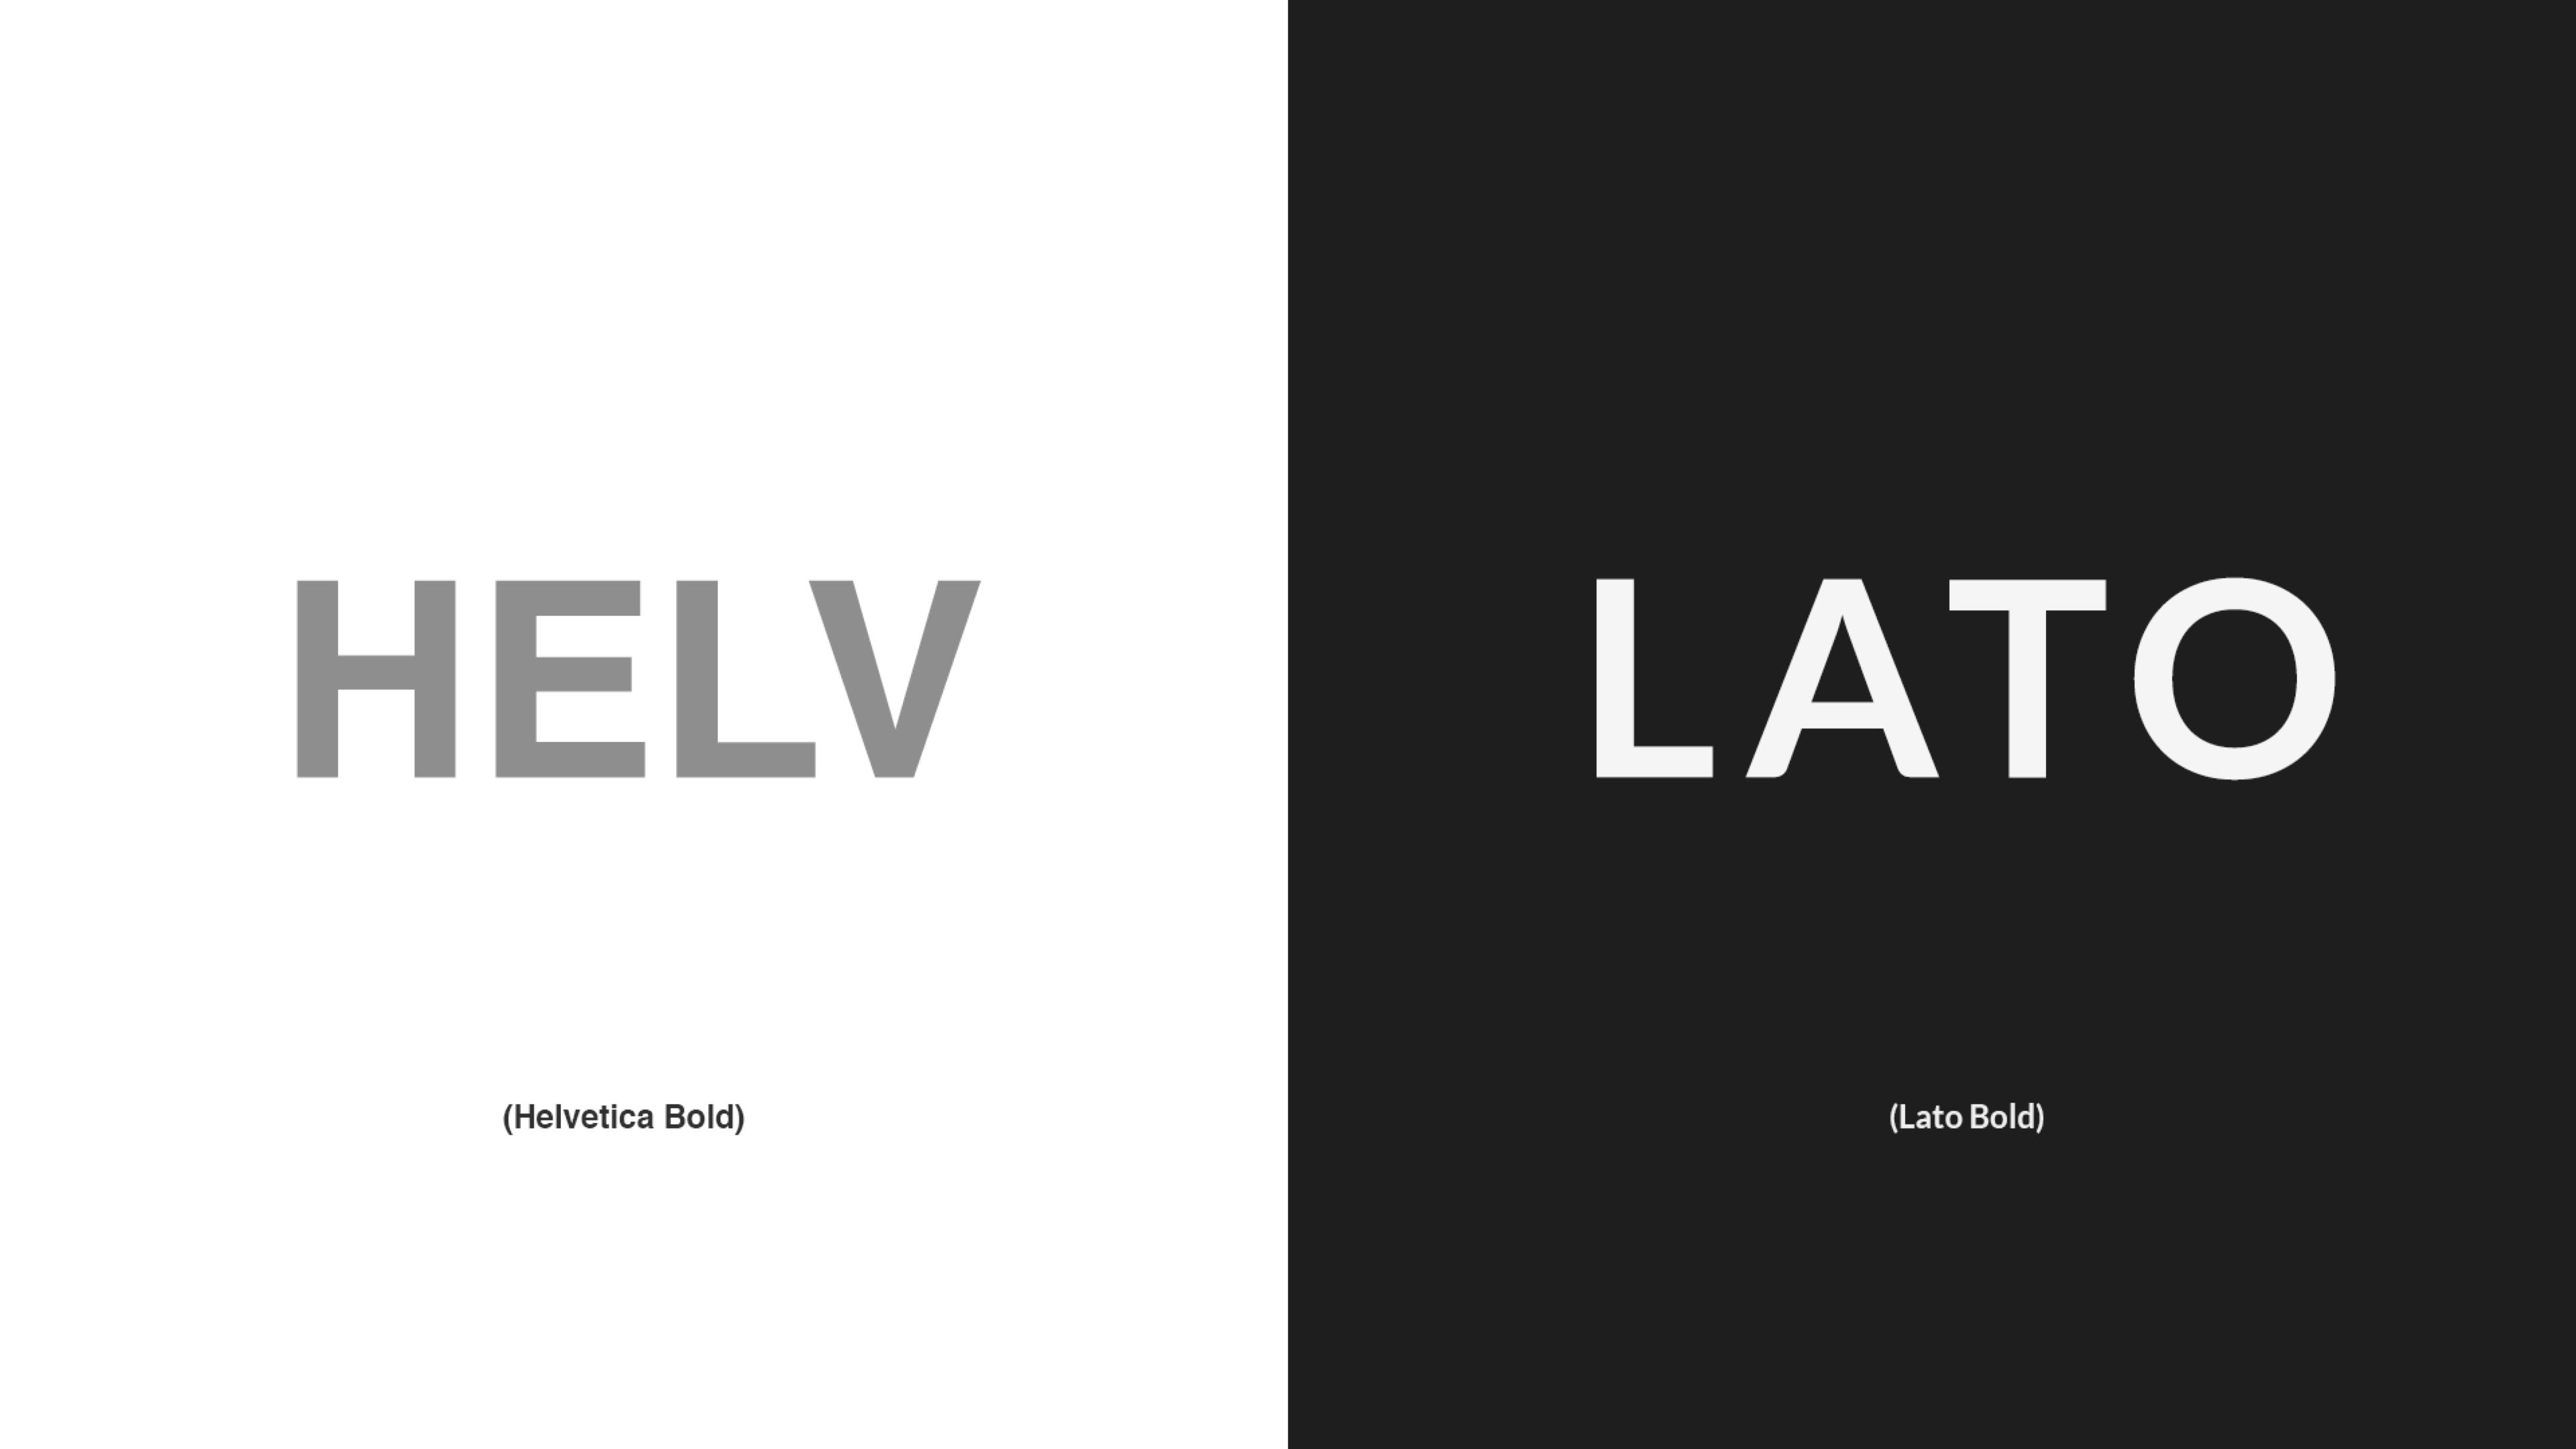 Helvetica font vs Lato font